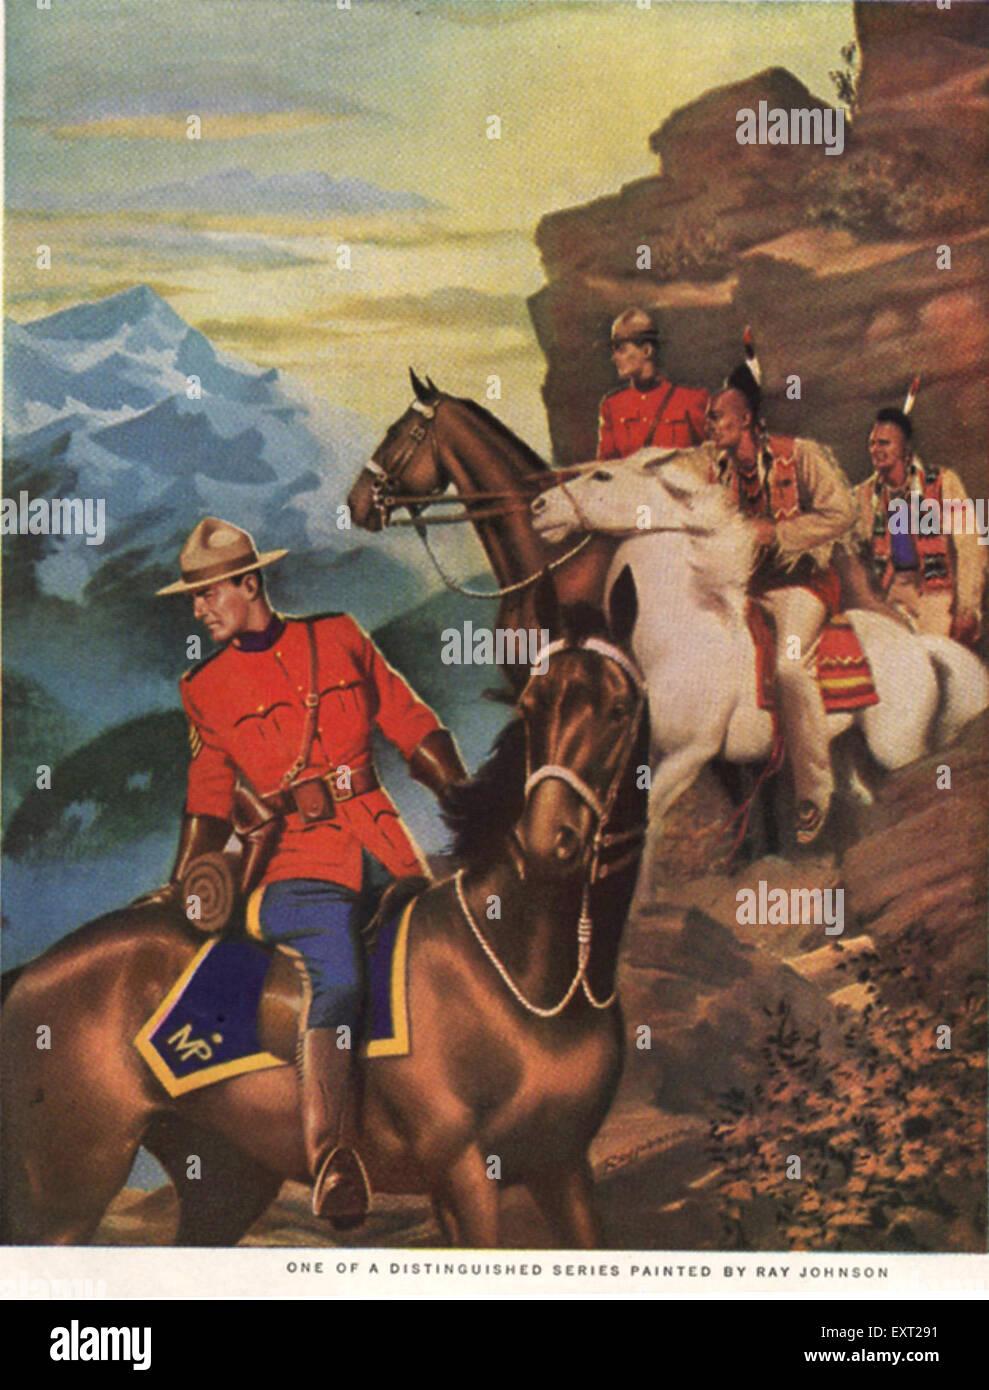 1940s USA Royal Canadian Mounted Police Magazine Advert (detail) - Stock Image